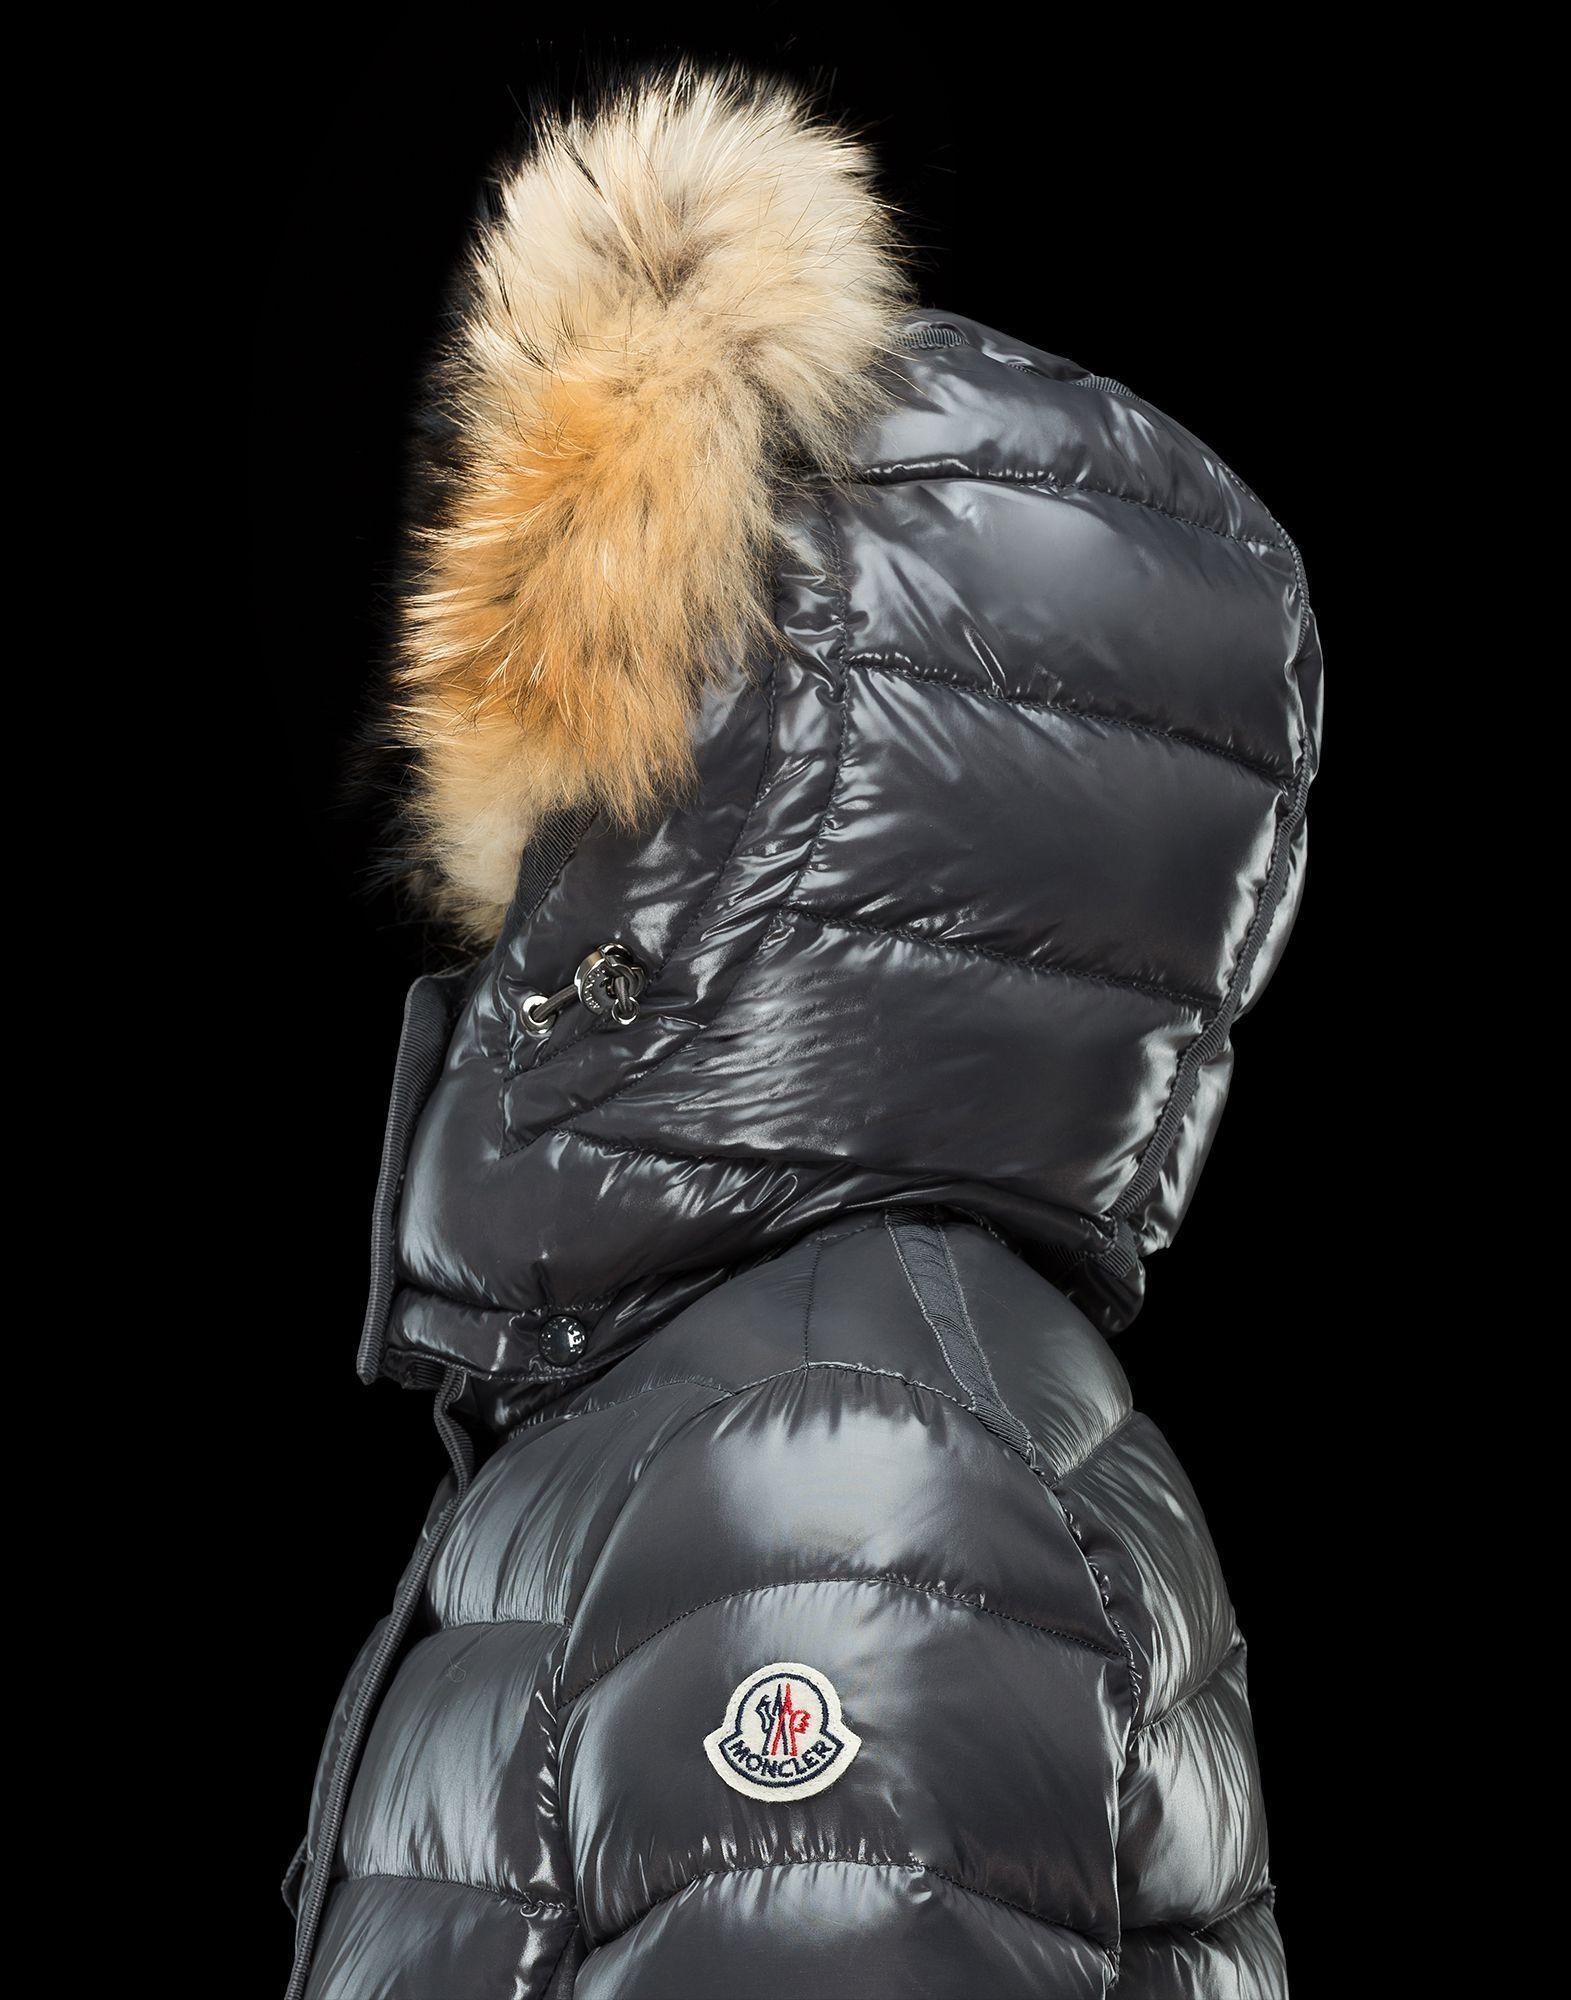 Moncler Down Jackets 17 18 Winter Moncler Armoise Dark Grey 4 Moncler Jackets Moncler Jacket [ 2000 x 1571 Pixel ]